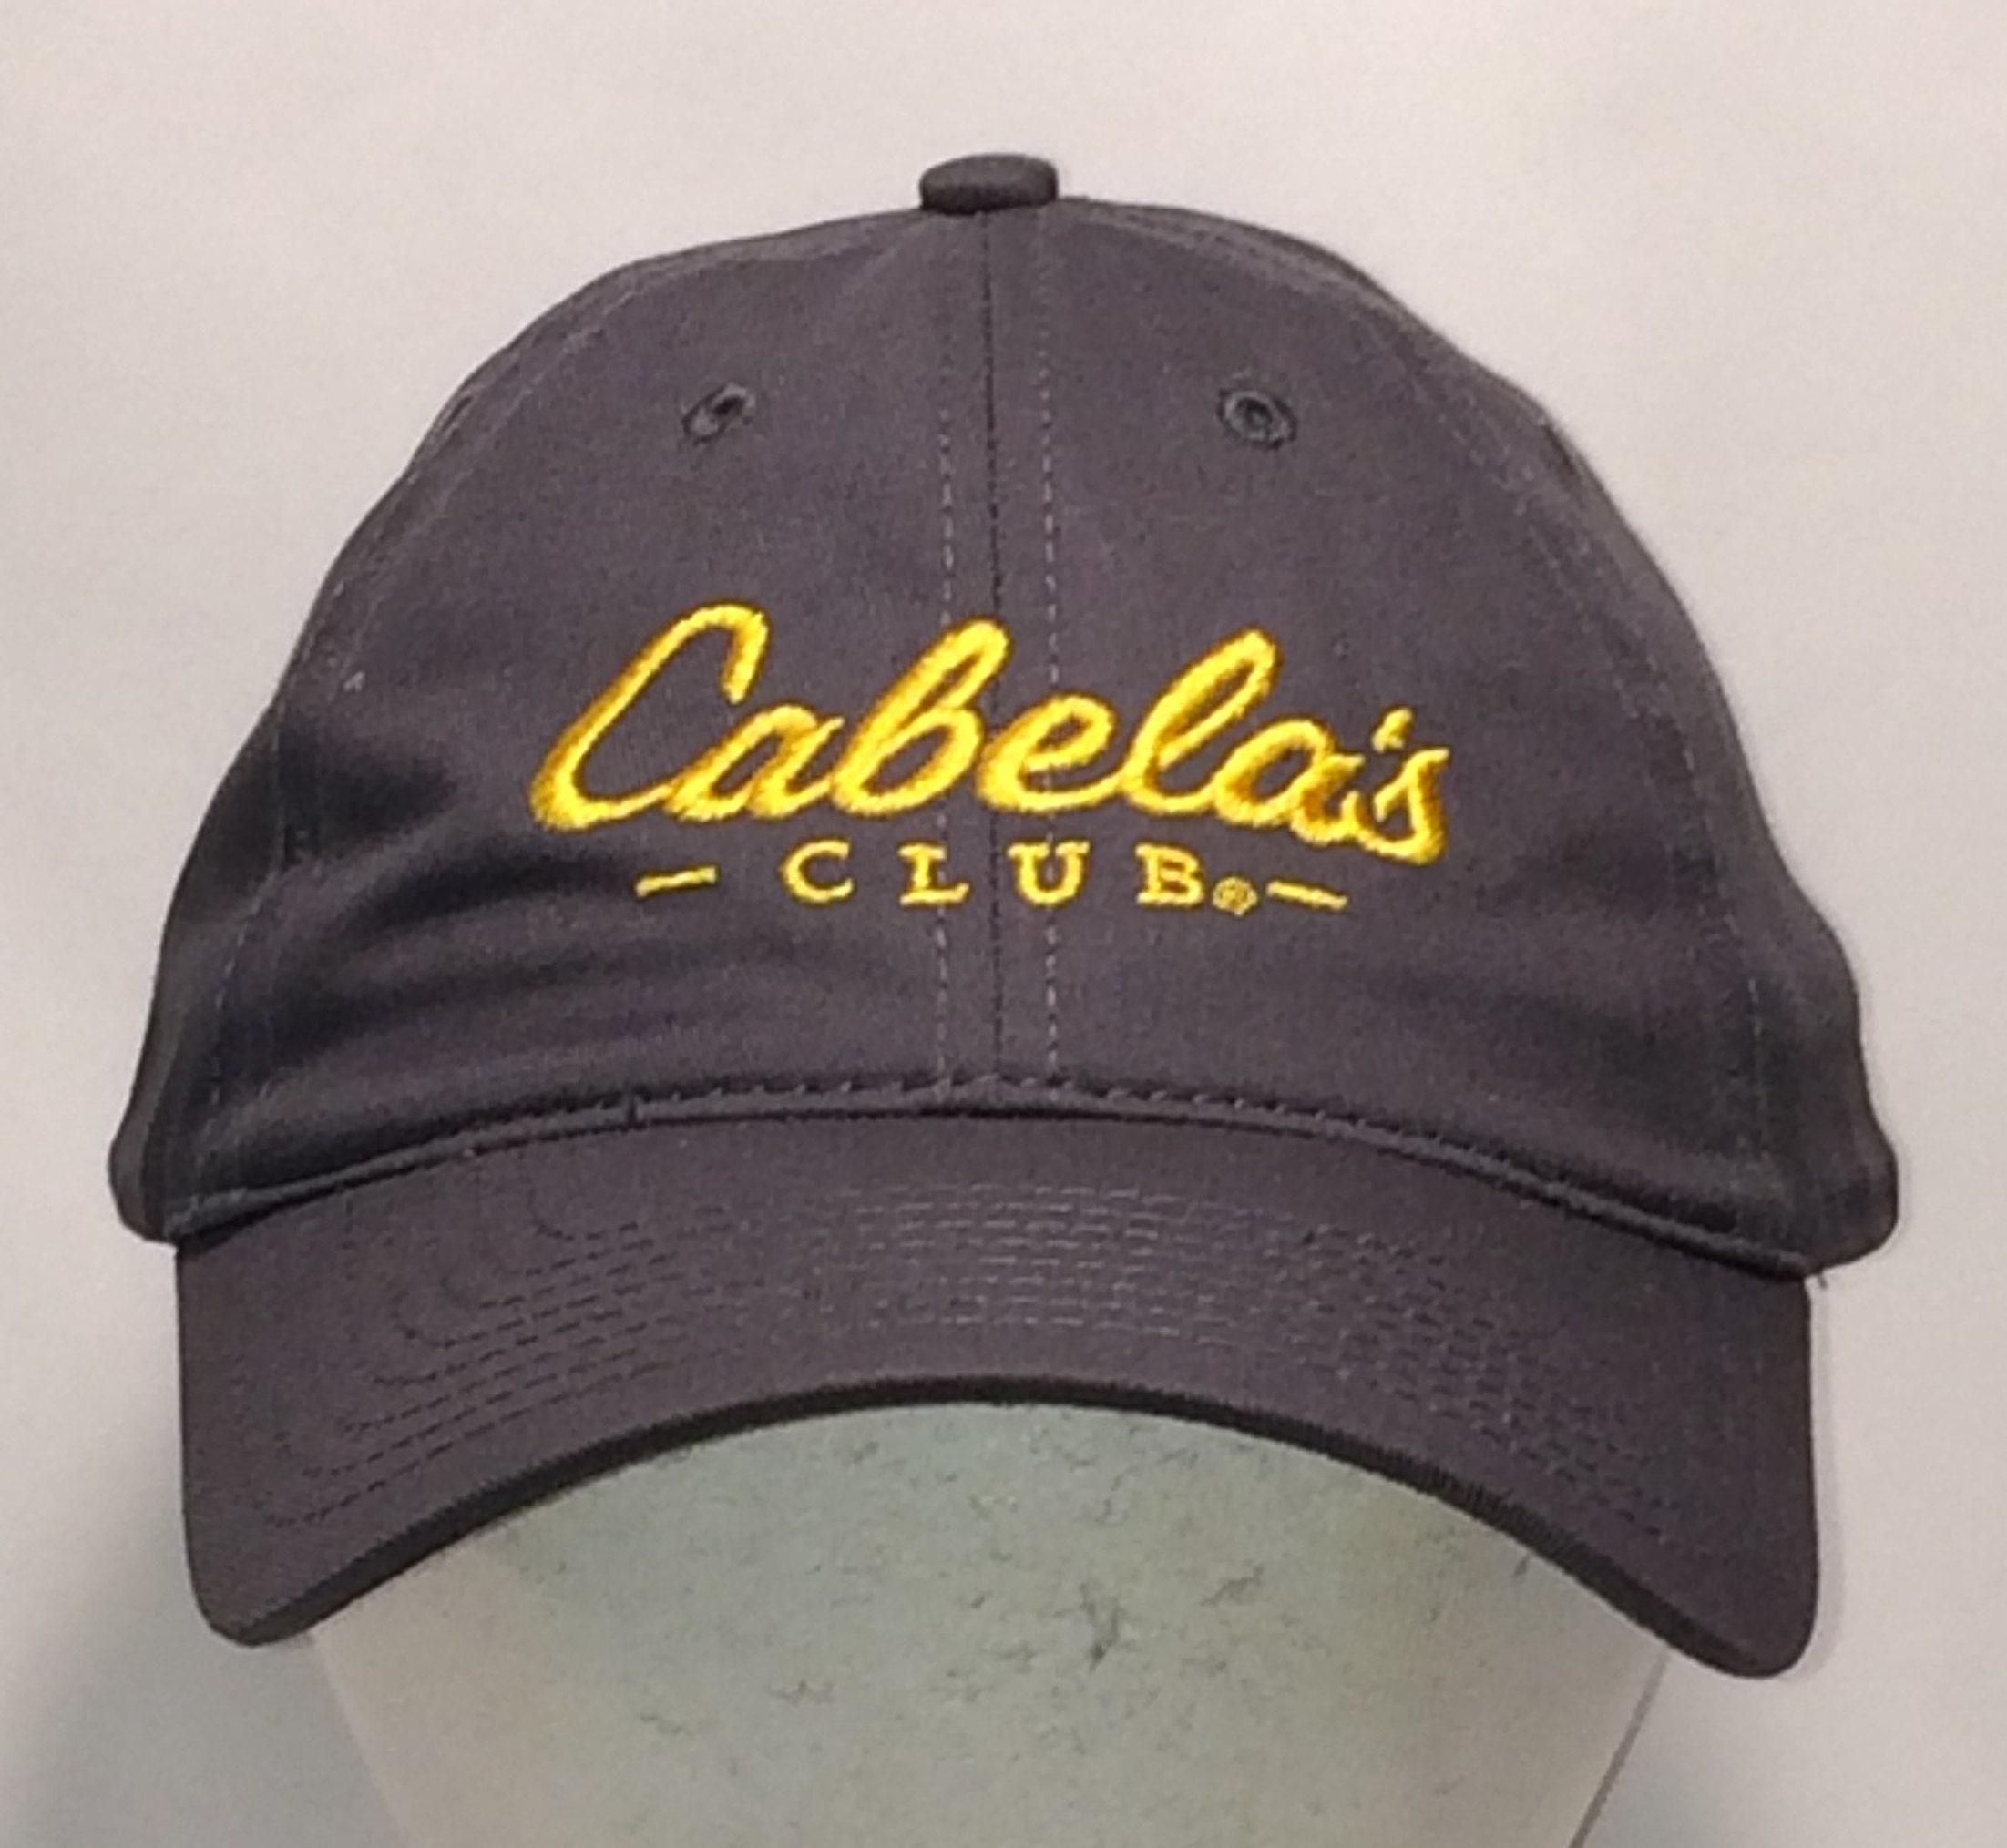 Cabelas Club Strapback Hat Fishing Hunting Boating Camping  245349231b5